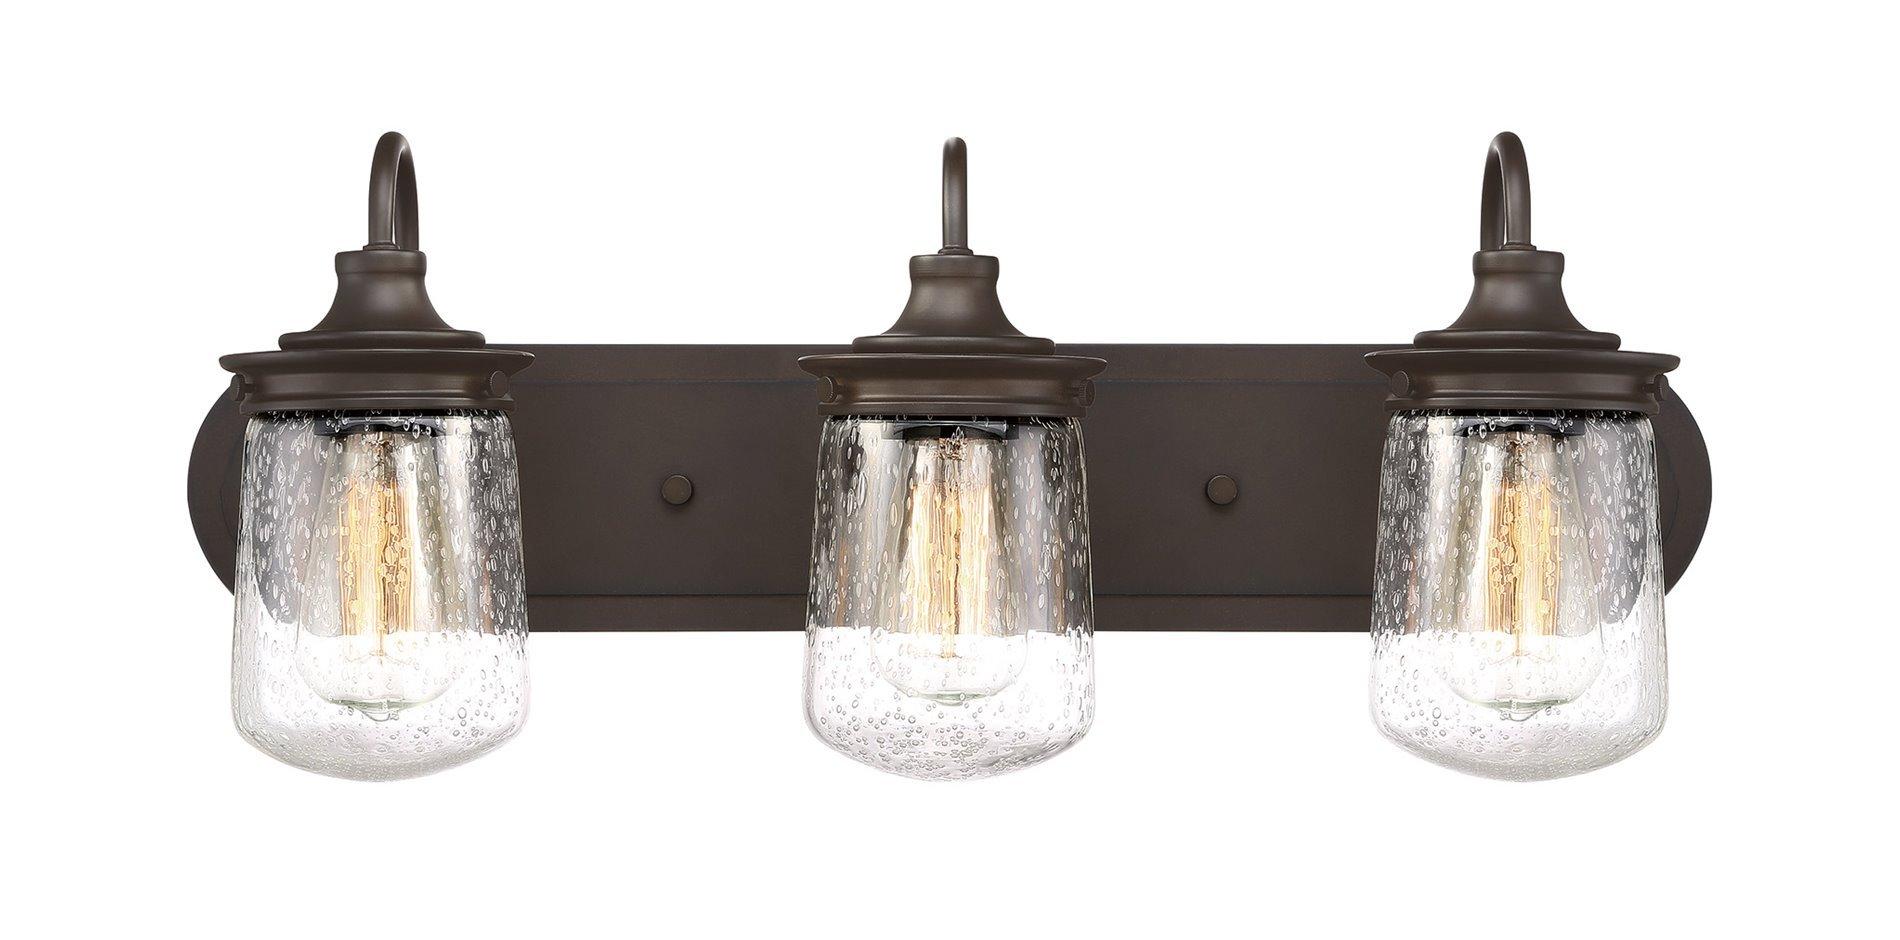 Kira Home Mason 23'' 3-Light Industrial Vanity/Bathroom Light + Seeded Glass Shade, Oil-Rubbed Bronze Finish by Kira Home (Image #2)